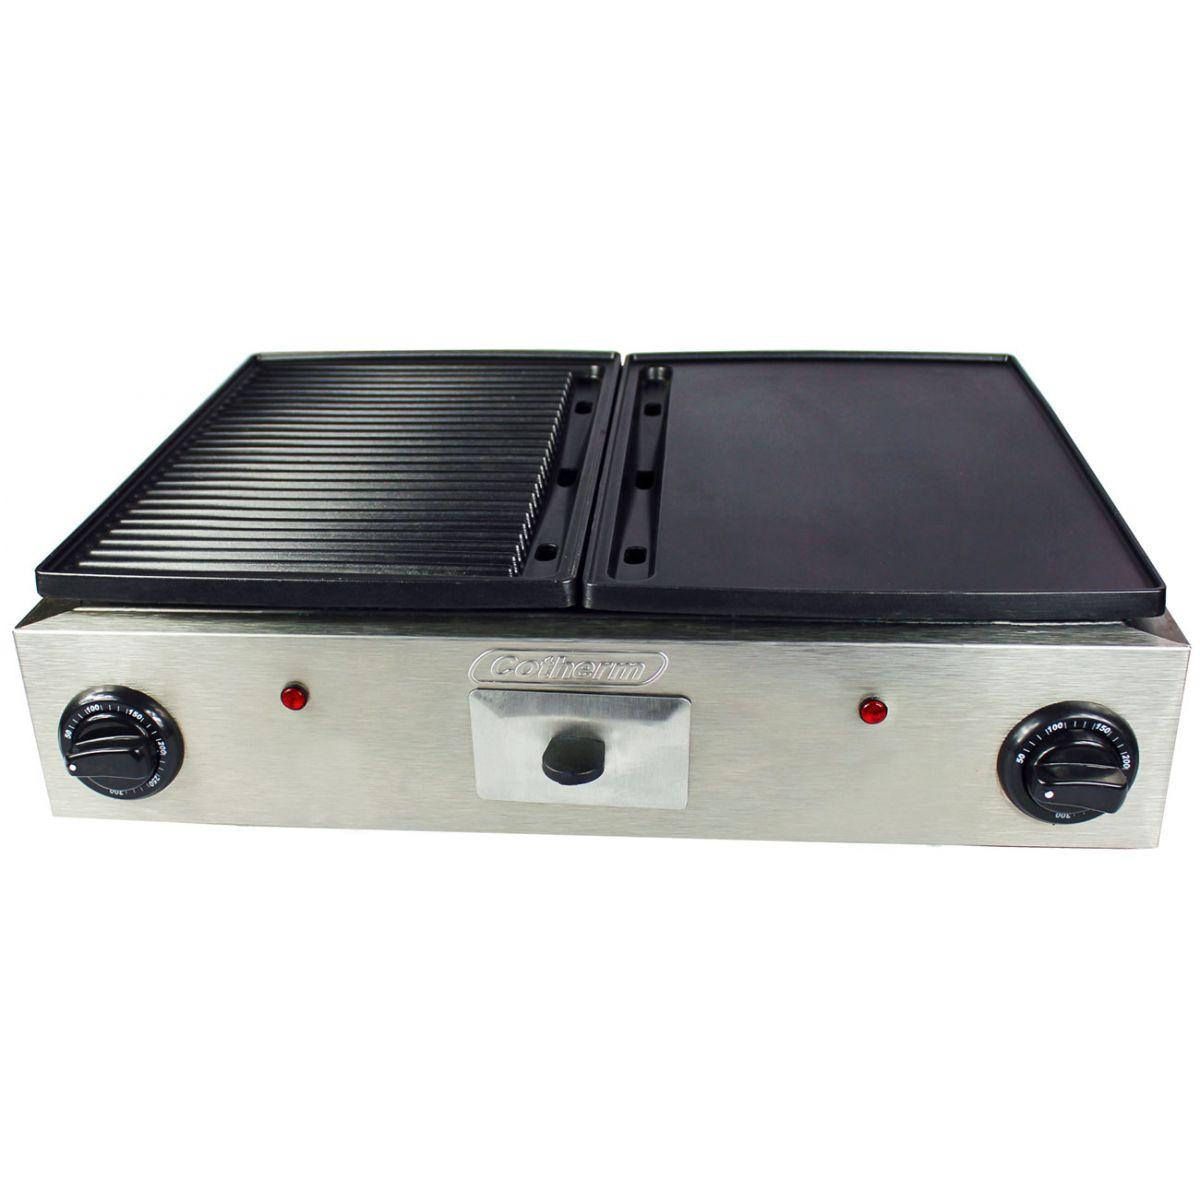 Chapeira Elétrica Profissional Grill e Lanches Cotherm  - Mix Eletro